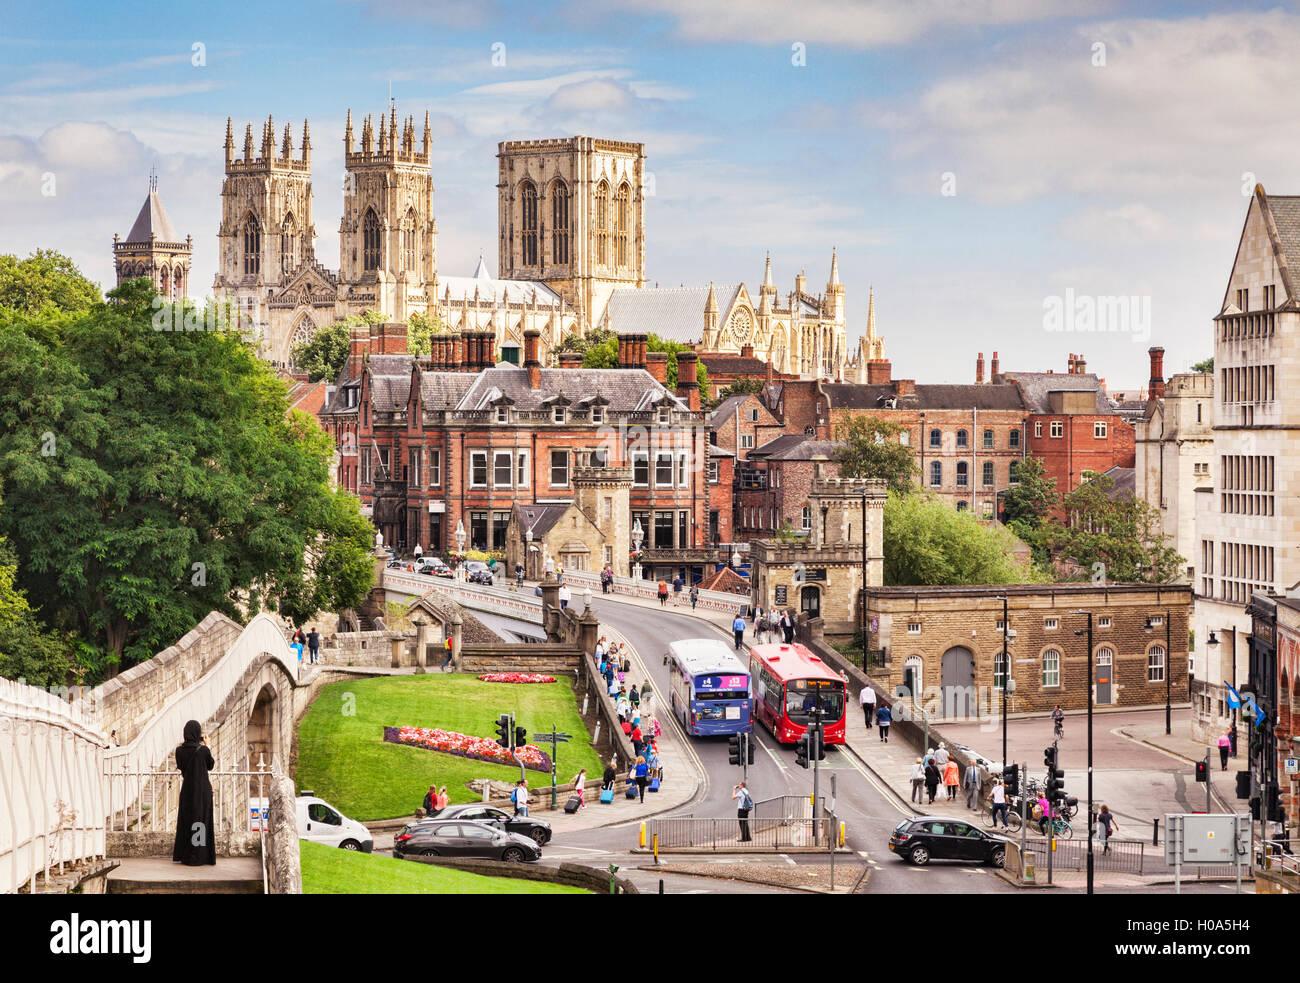 Le centre-ville de York Minster, et Wall, North Yorkshire, England, UK Photo Stock